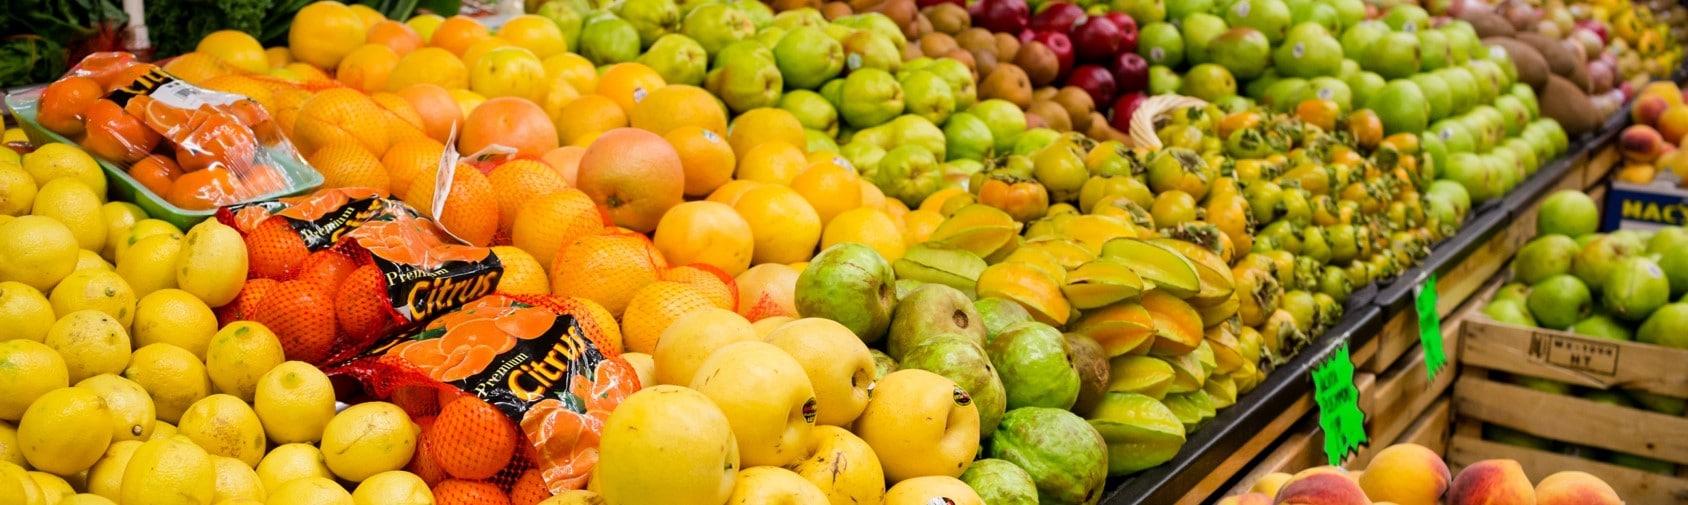 Storing Produce Ward's Supermarket Gainesville FL